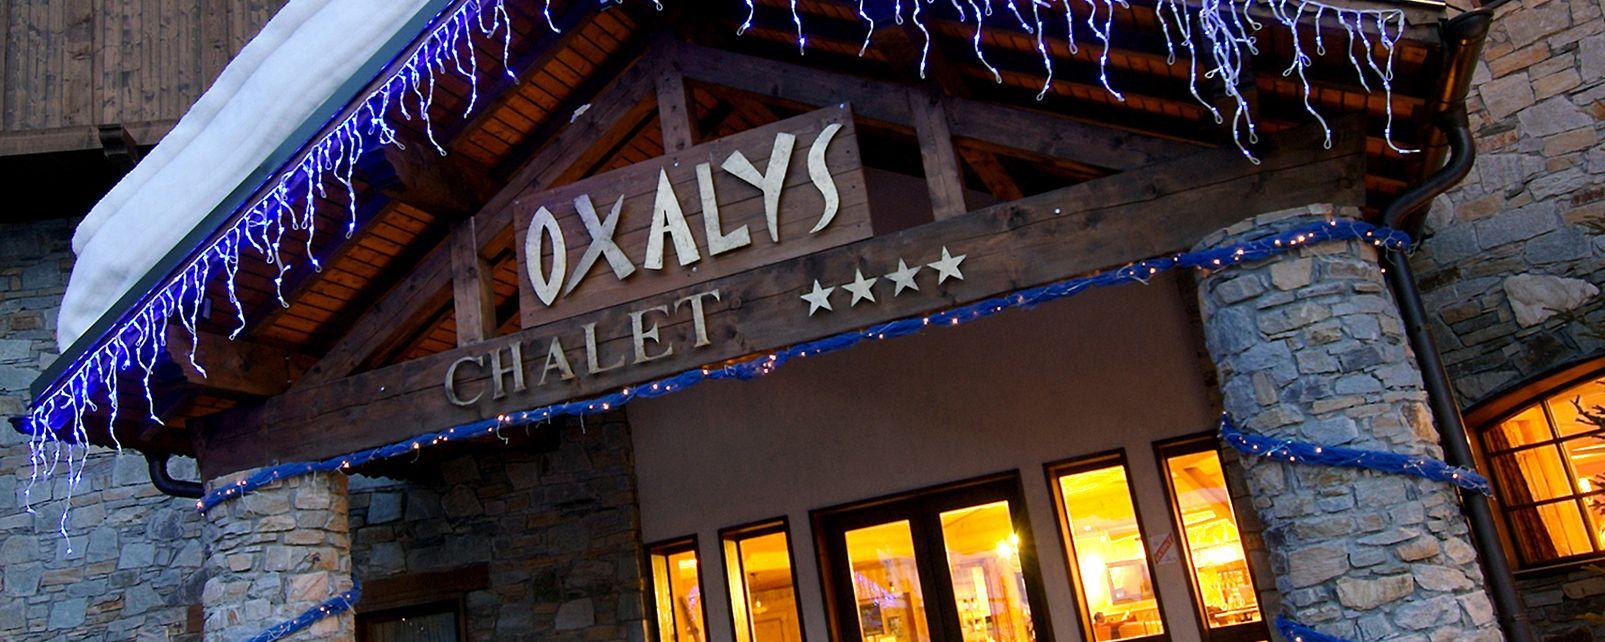 Hotel L'Oxalys